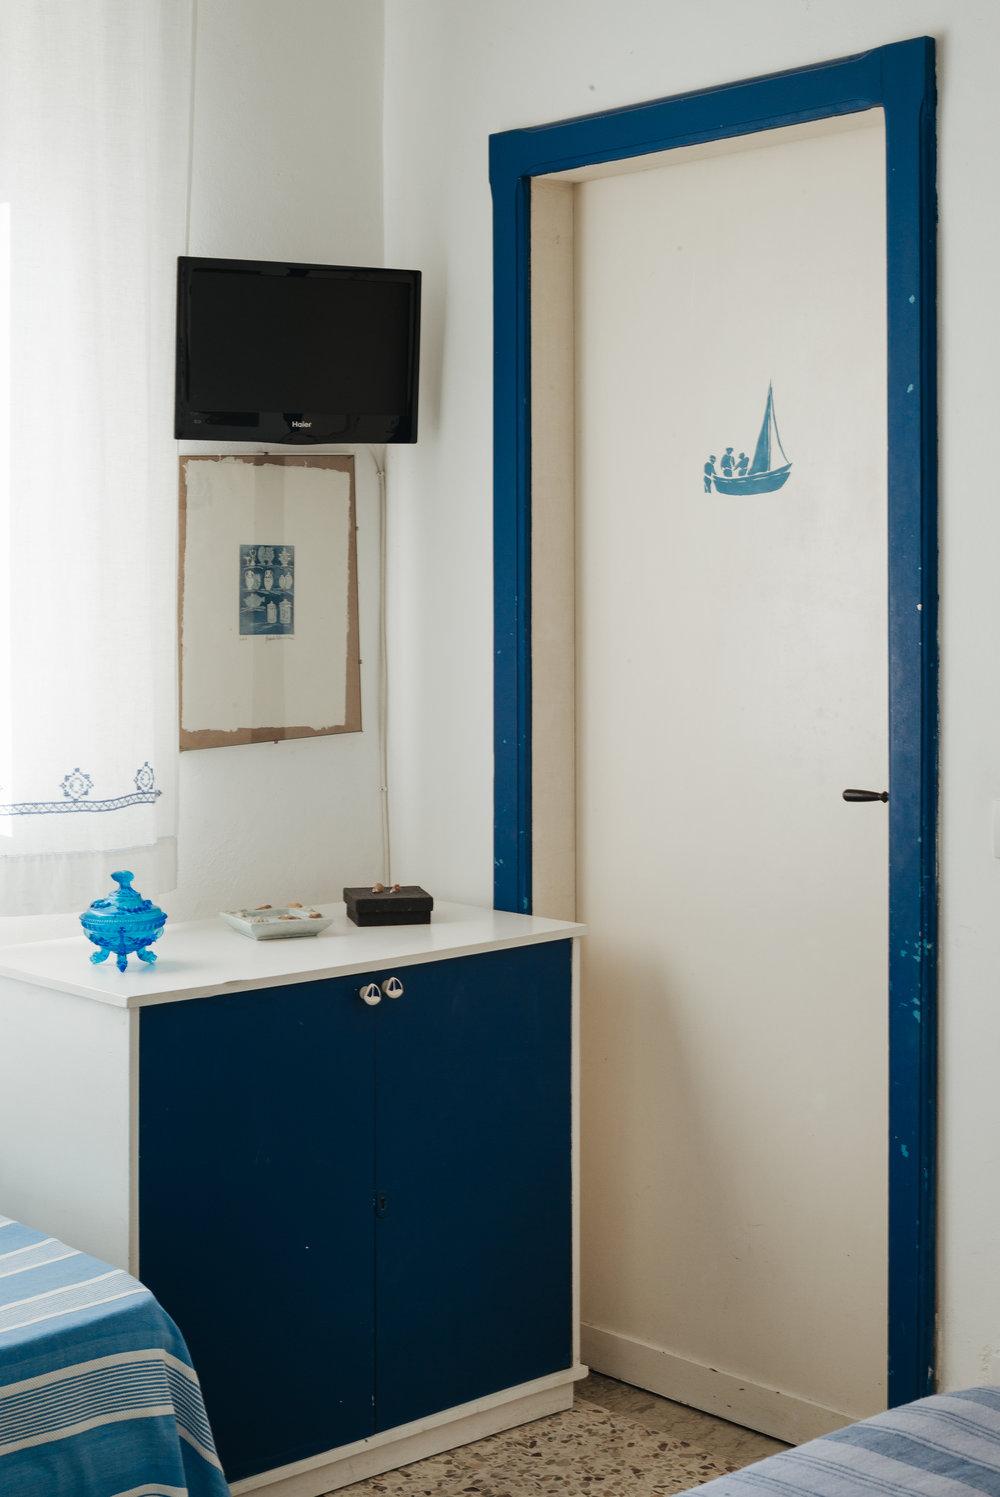 16sampieri-casa-vacanze-sicilia-appartamento-sicily-holiday-apartment-casazzurra-italia-italy.jpg